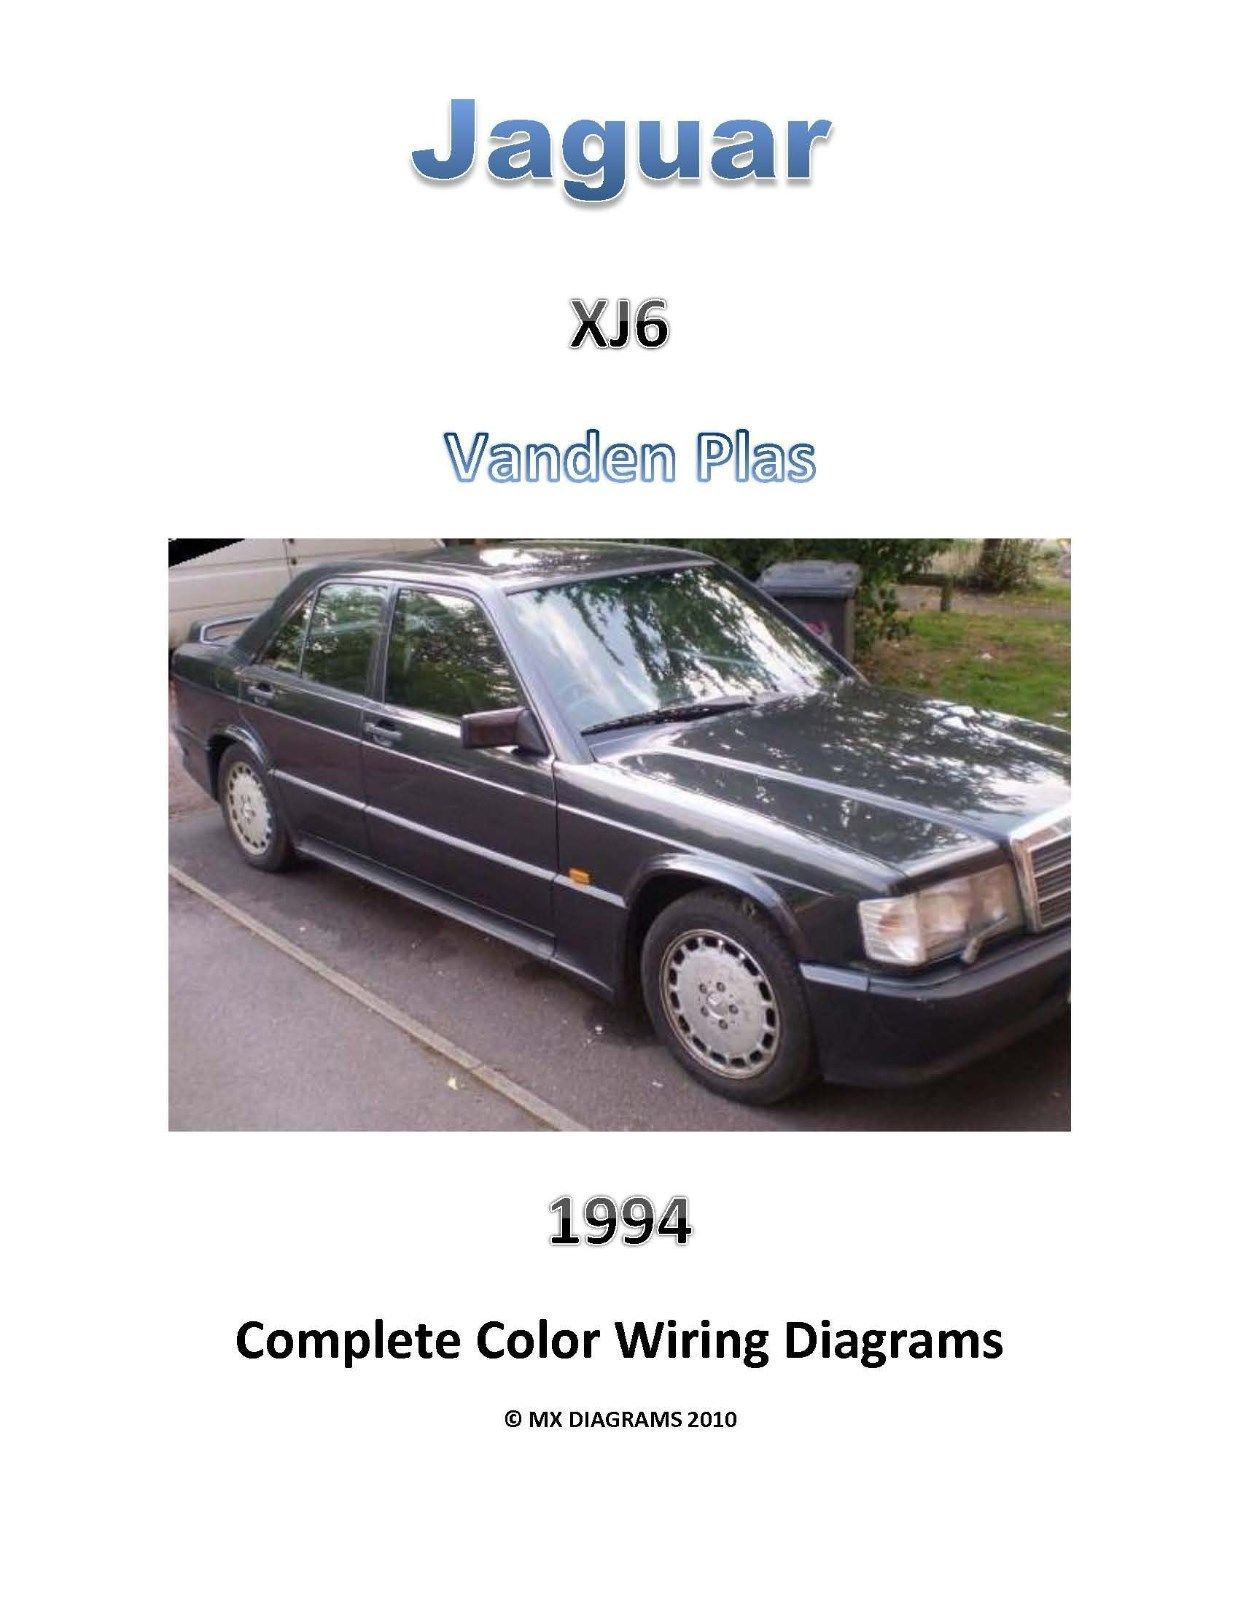 S l1600. S l1600. Jaguar XJ6 Vanden Plas 1994 94 complete color wiring  diagram schematic digital; Jaguar ...